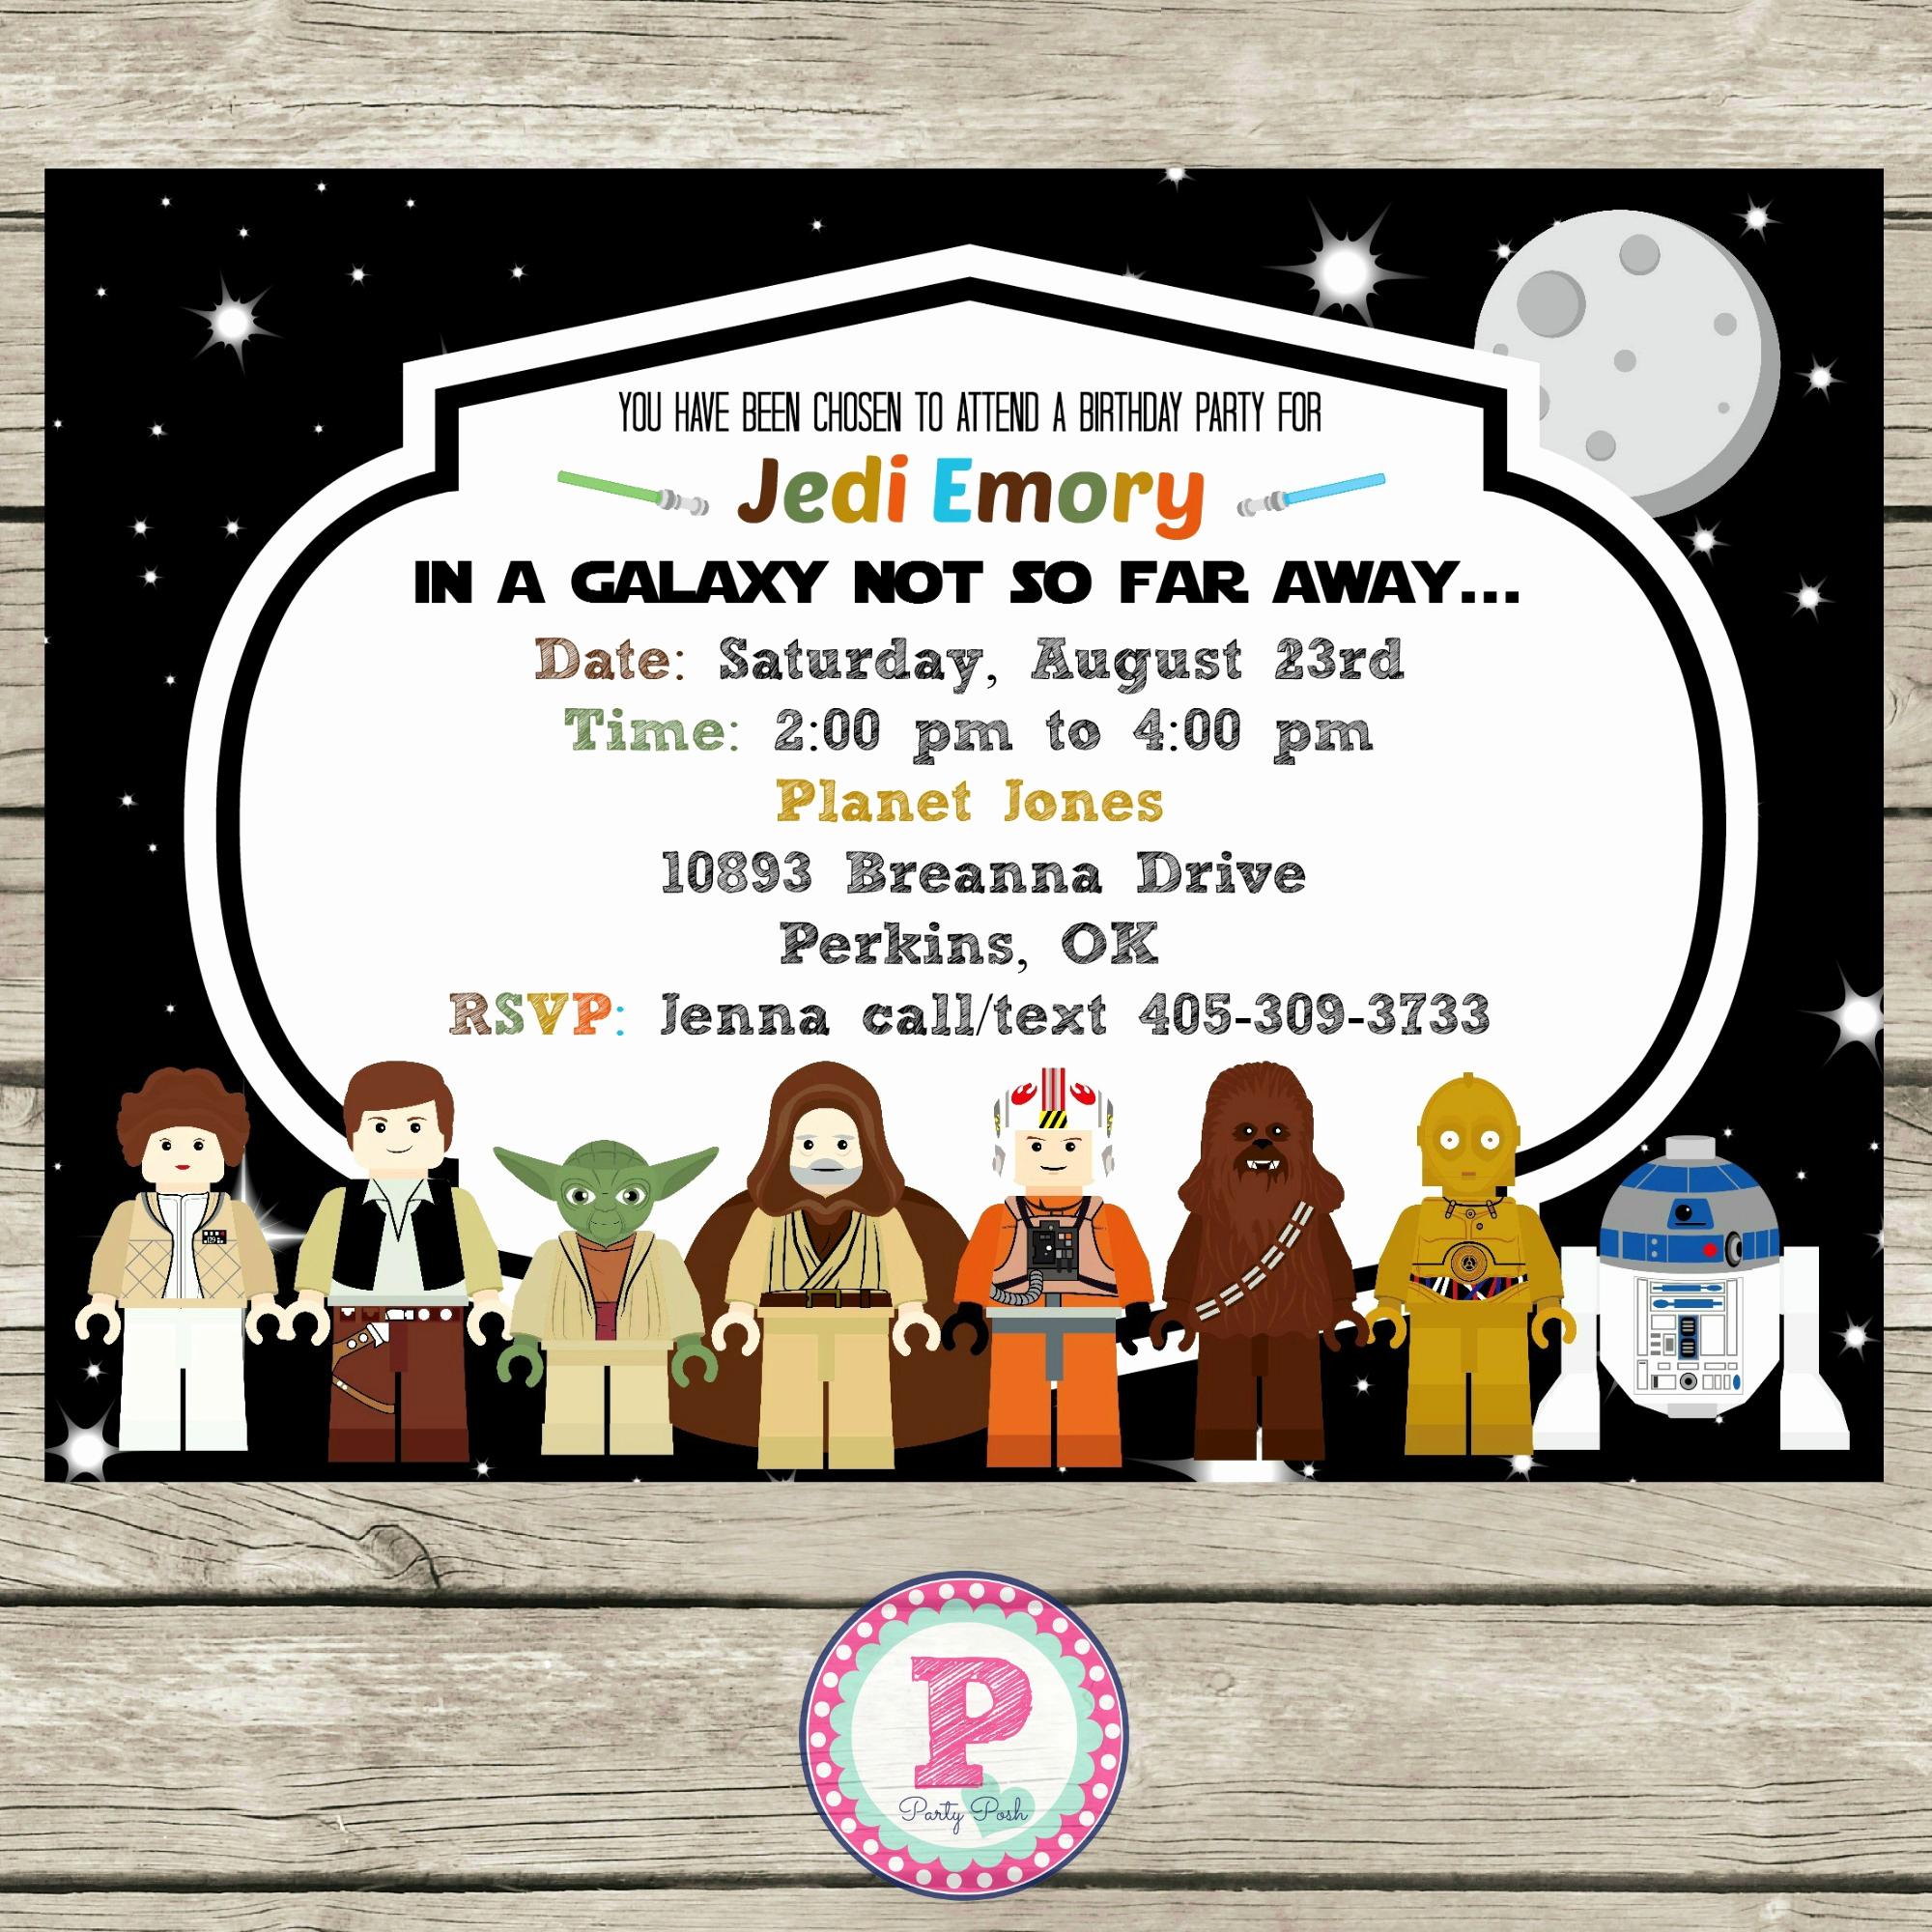 Star Wars Party Invitation Template New Star Wars Birthday Invitations Wording